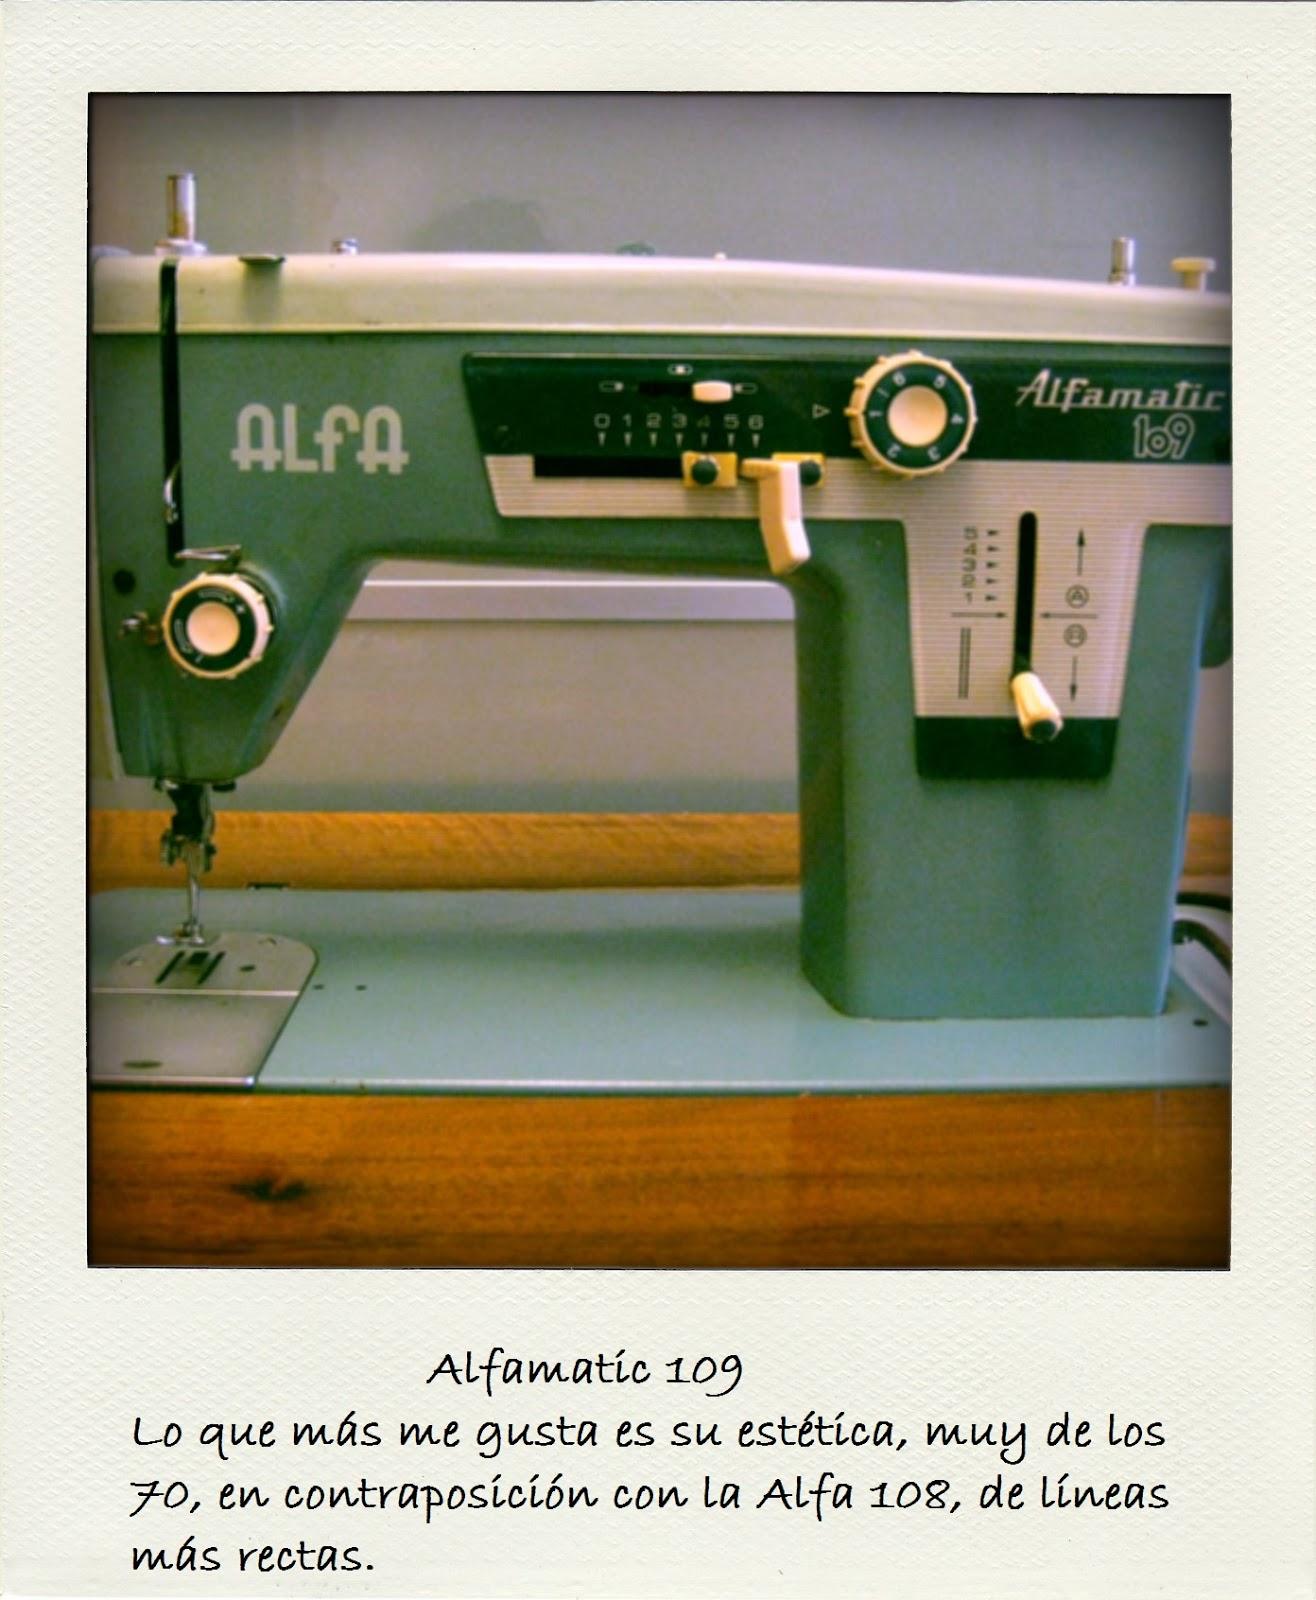 Alfamatic aprende a coser: Alfamatic 109